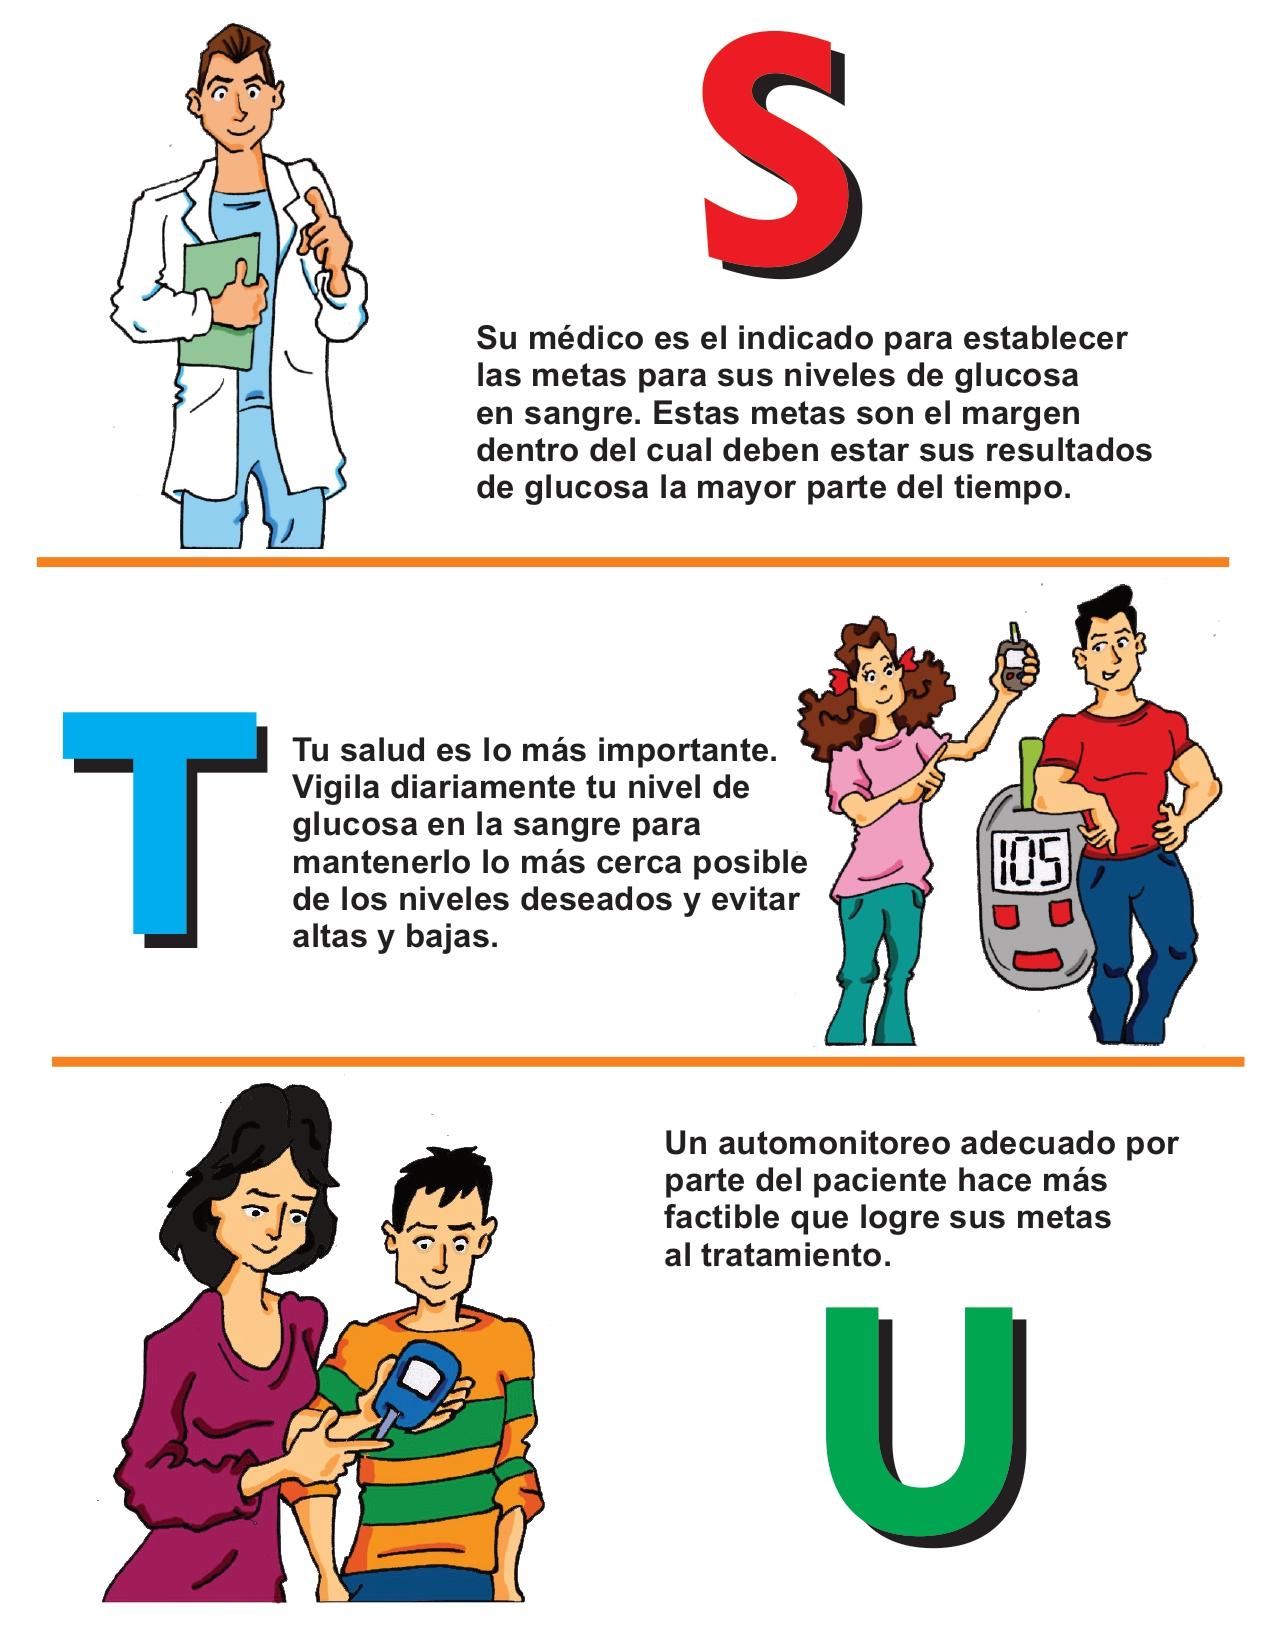 ABC automonitoreo diabetes_pages-to-jpg-0009